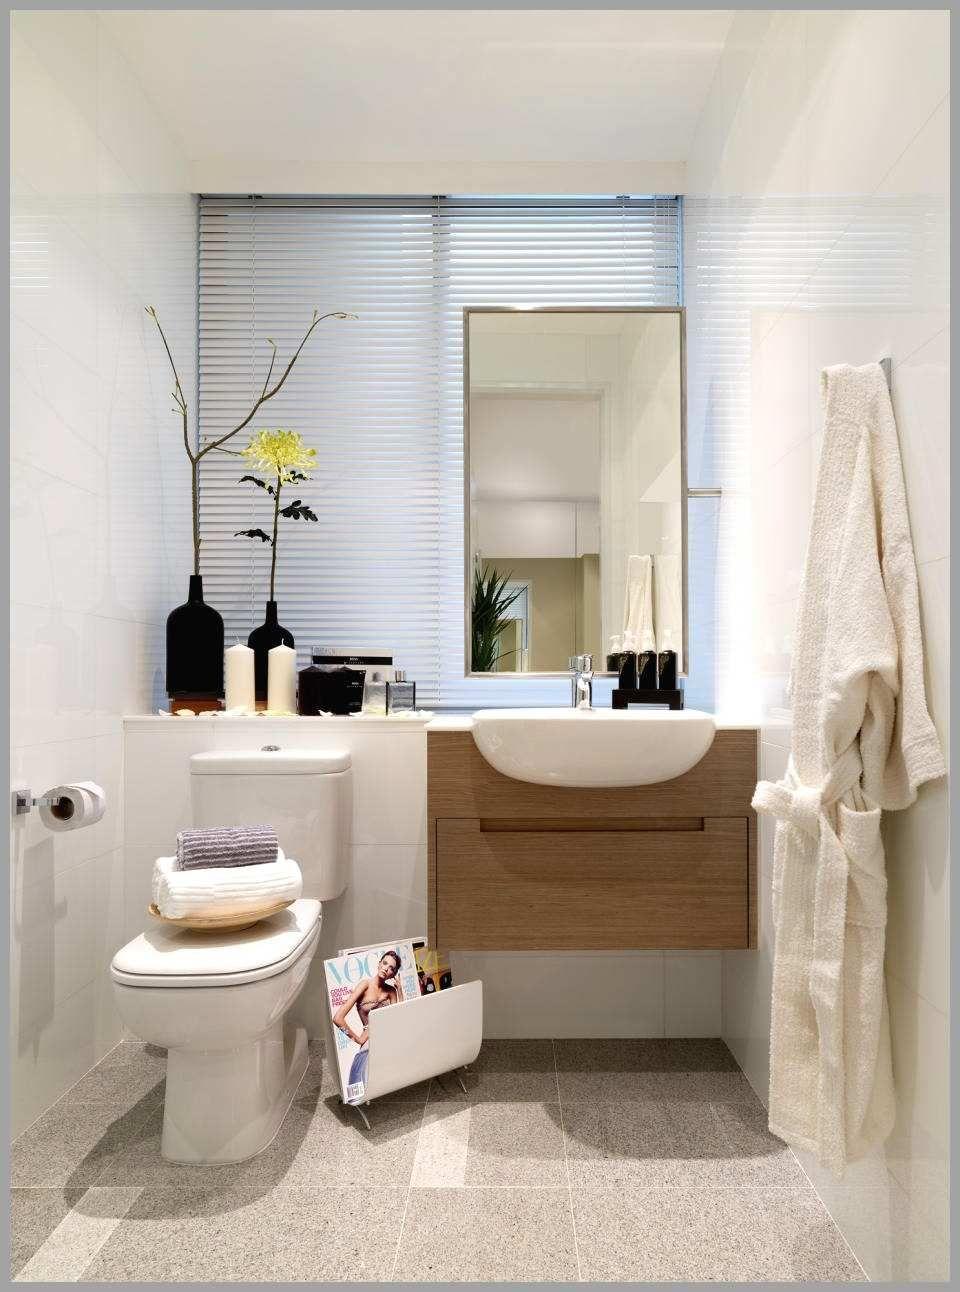 7 Essential Tips For Modern Bathroom Ideas For A Stylish Look Houseminds Bathroom Design Small Modern Bathroom Interior Design Simple Bathroom